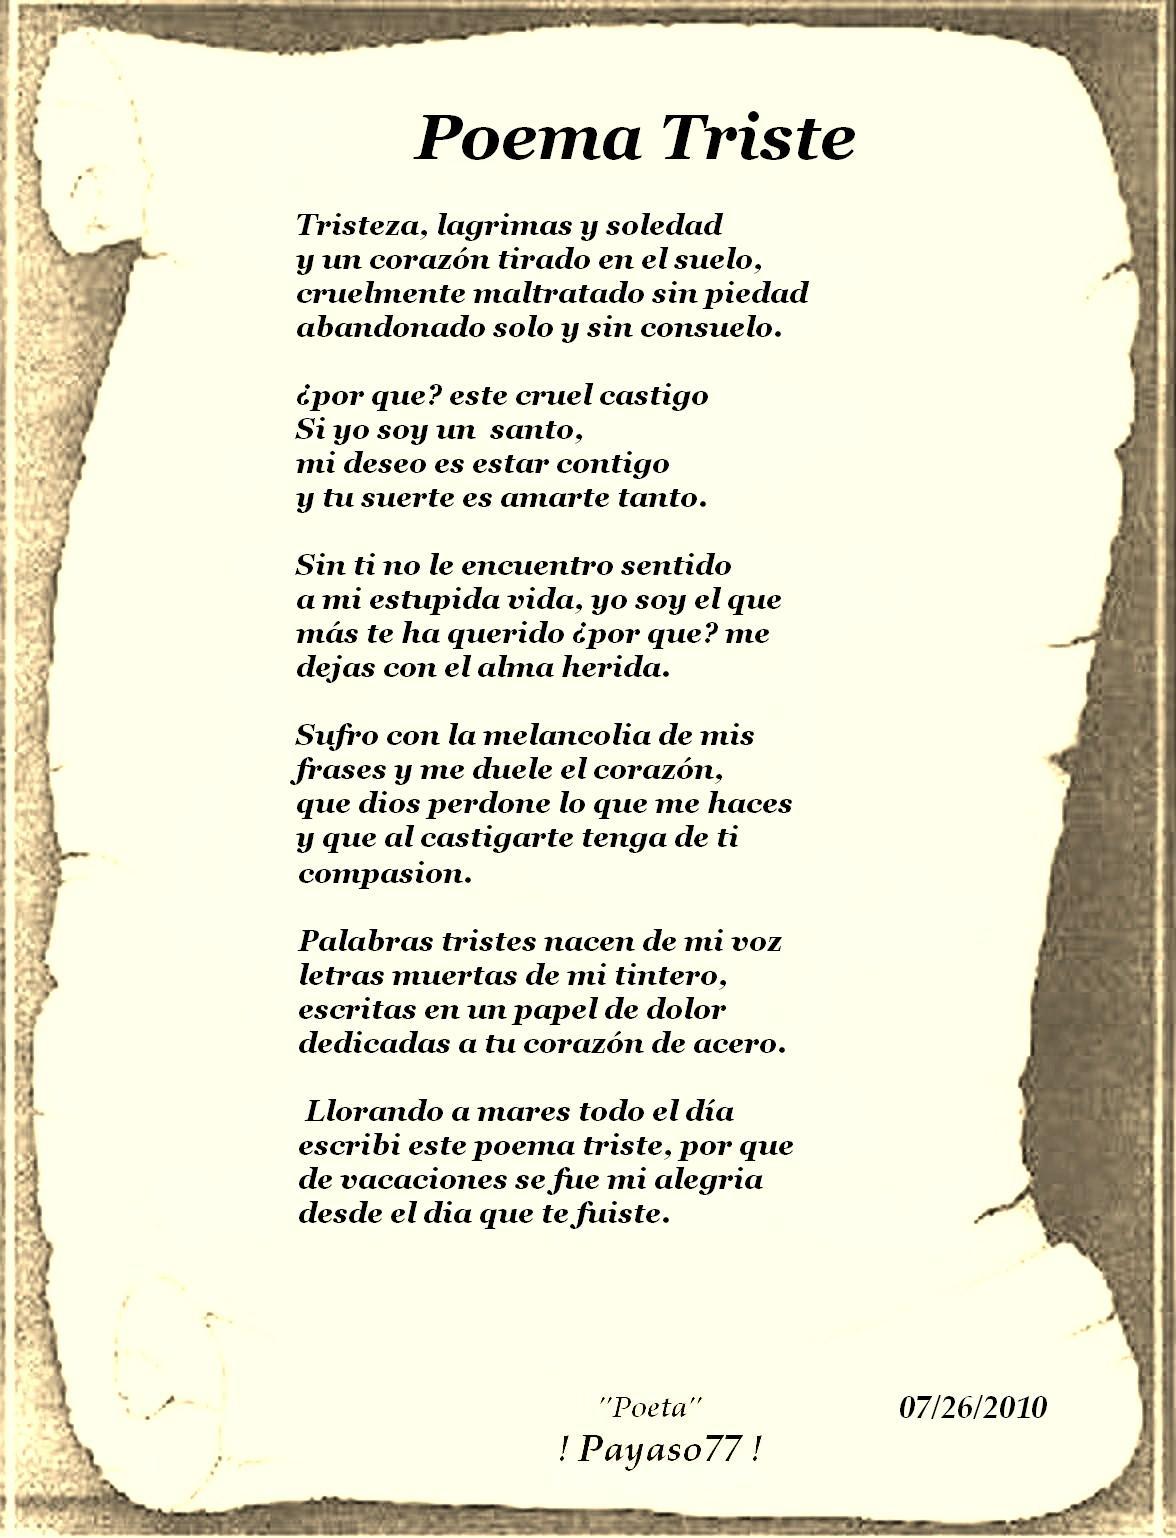 De Poemas Triste Corazon